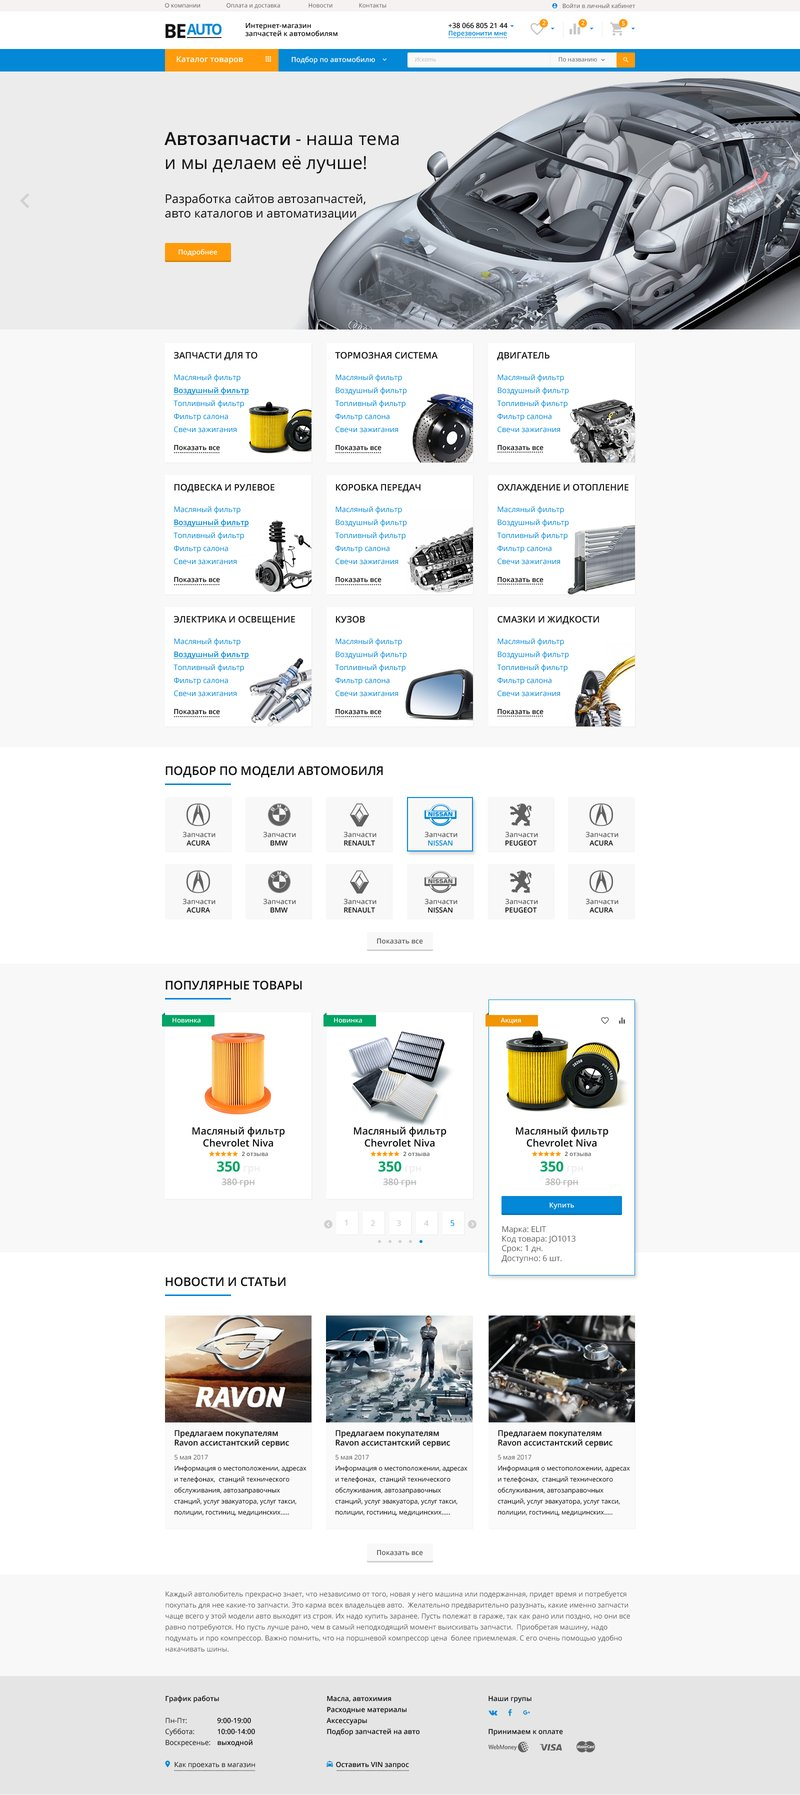 Дизайн интернет-магазина автозапчастей – работа в портфолио фрилансера